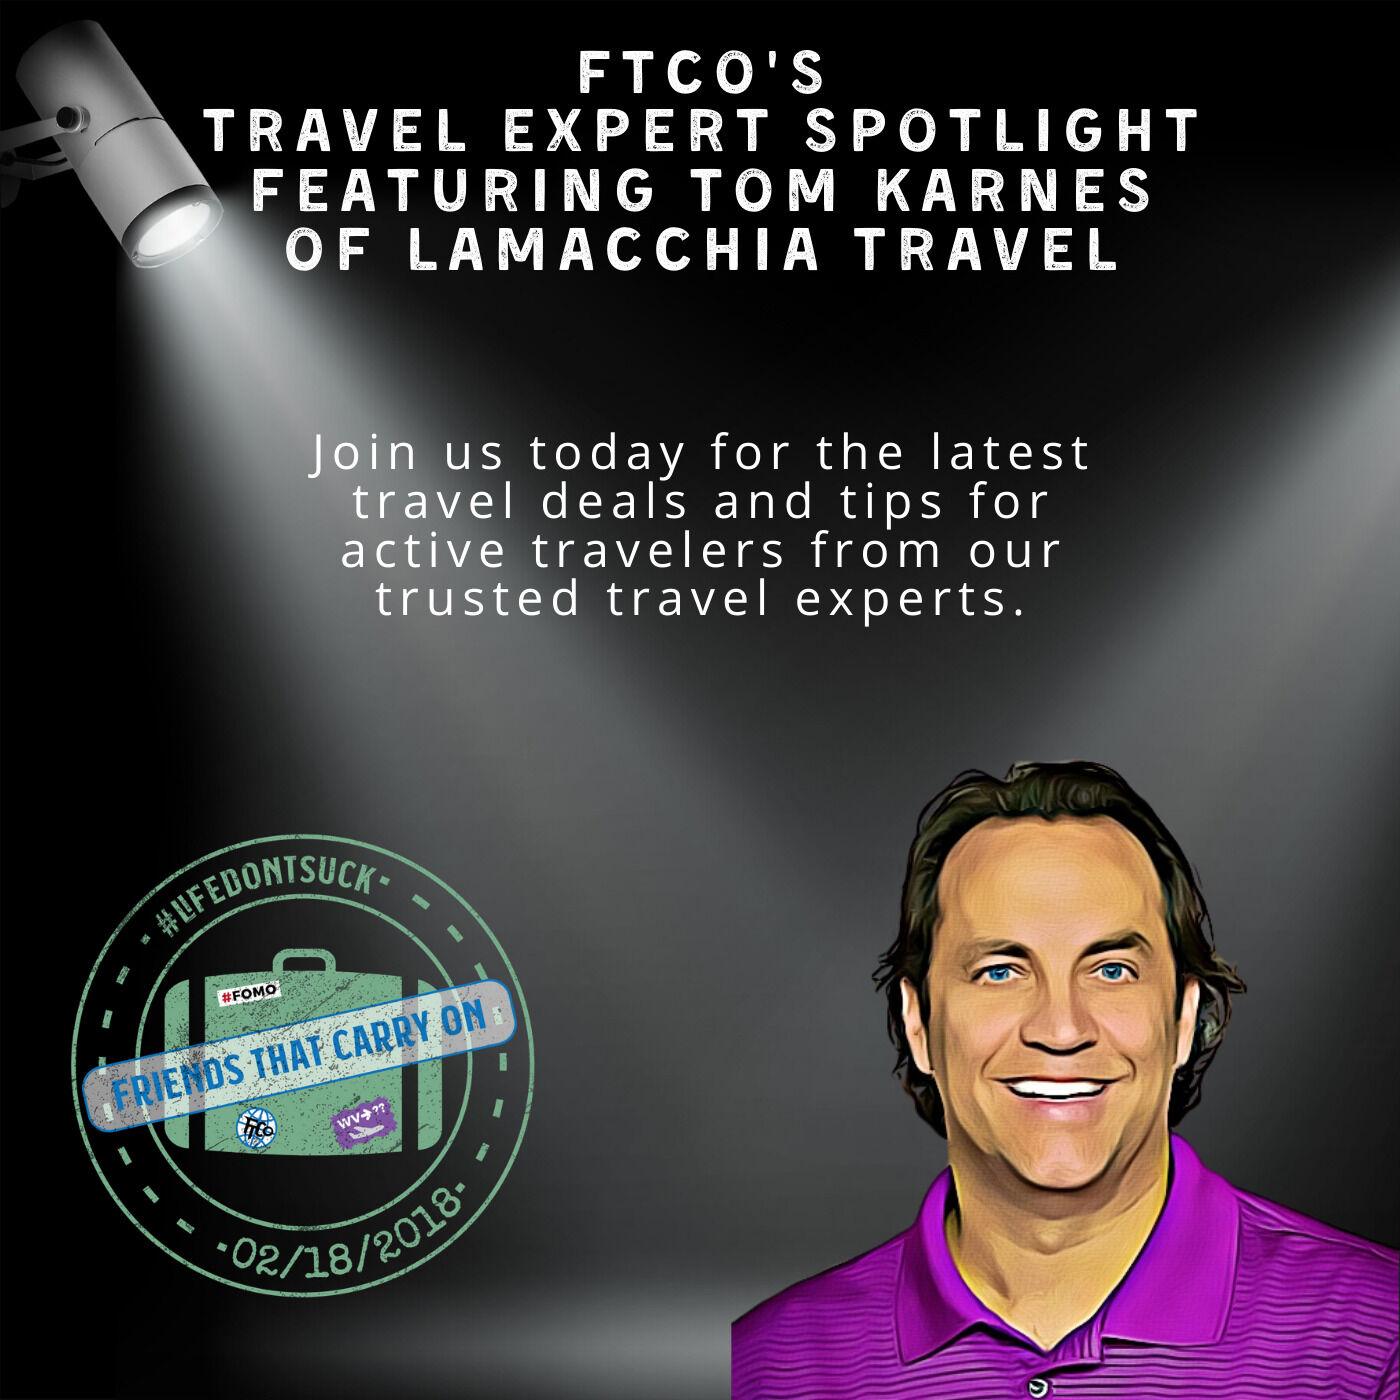 FTCO's Travel Expert Spotlight Featuring Tom Karnes of LaMacchia Travel